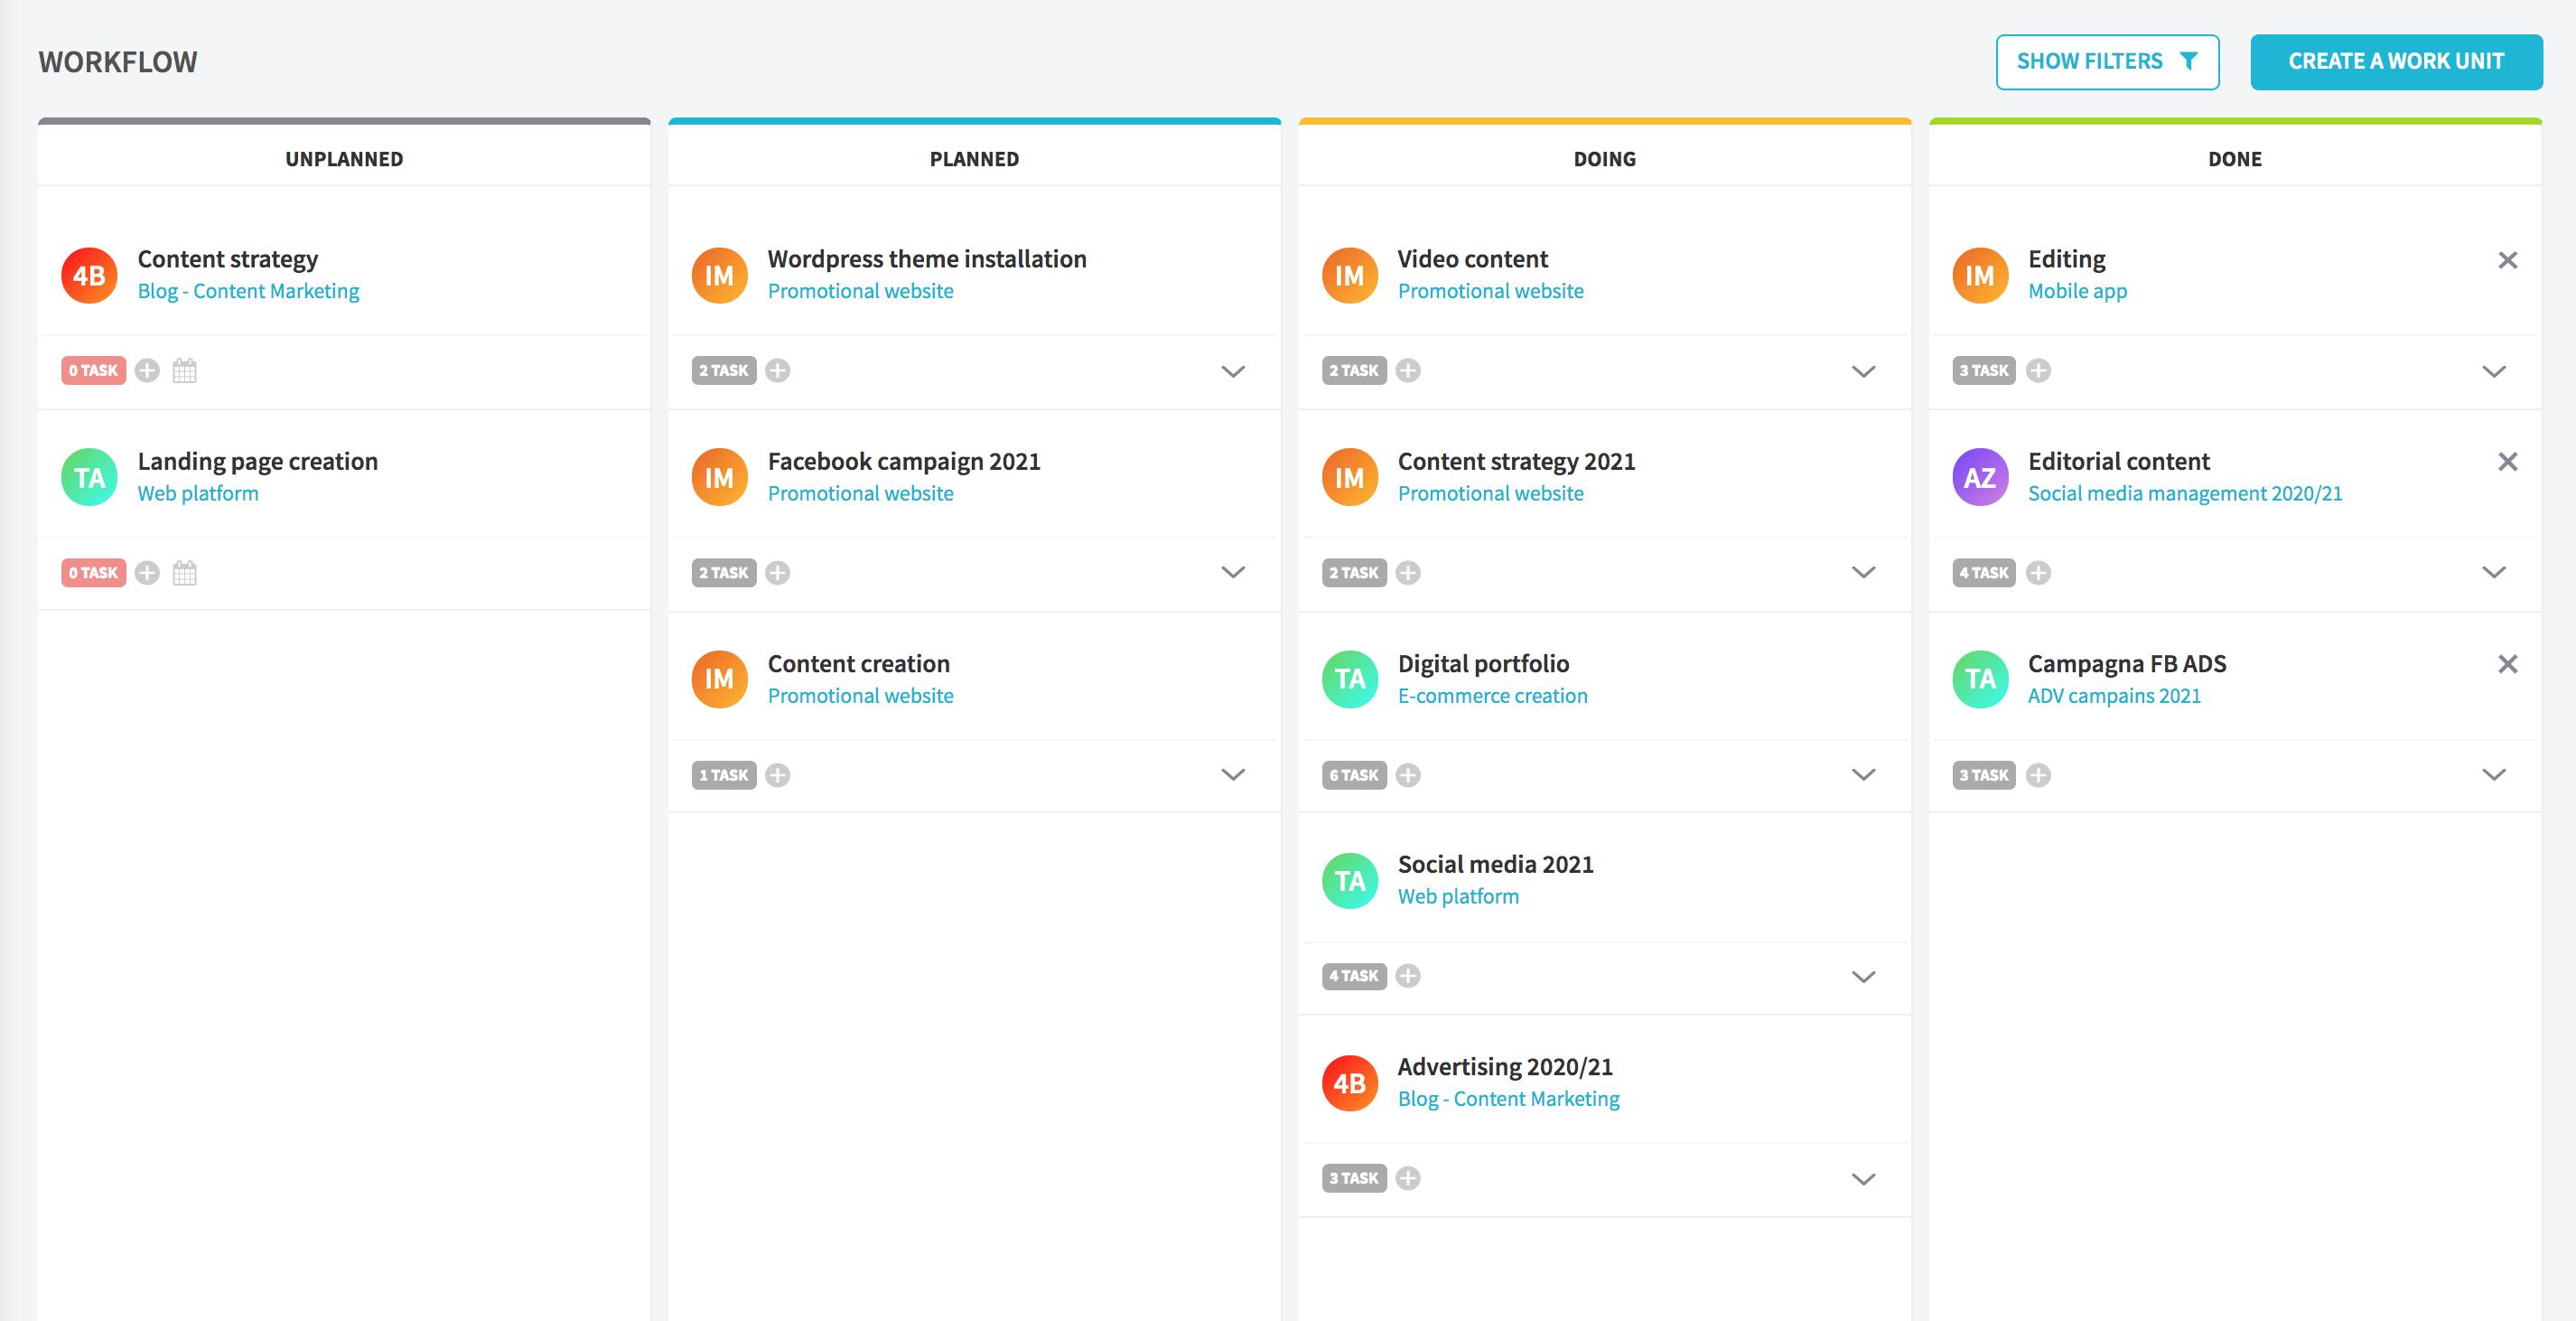 Taskomat task and project management software